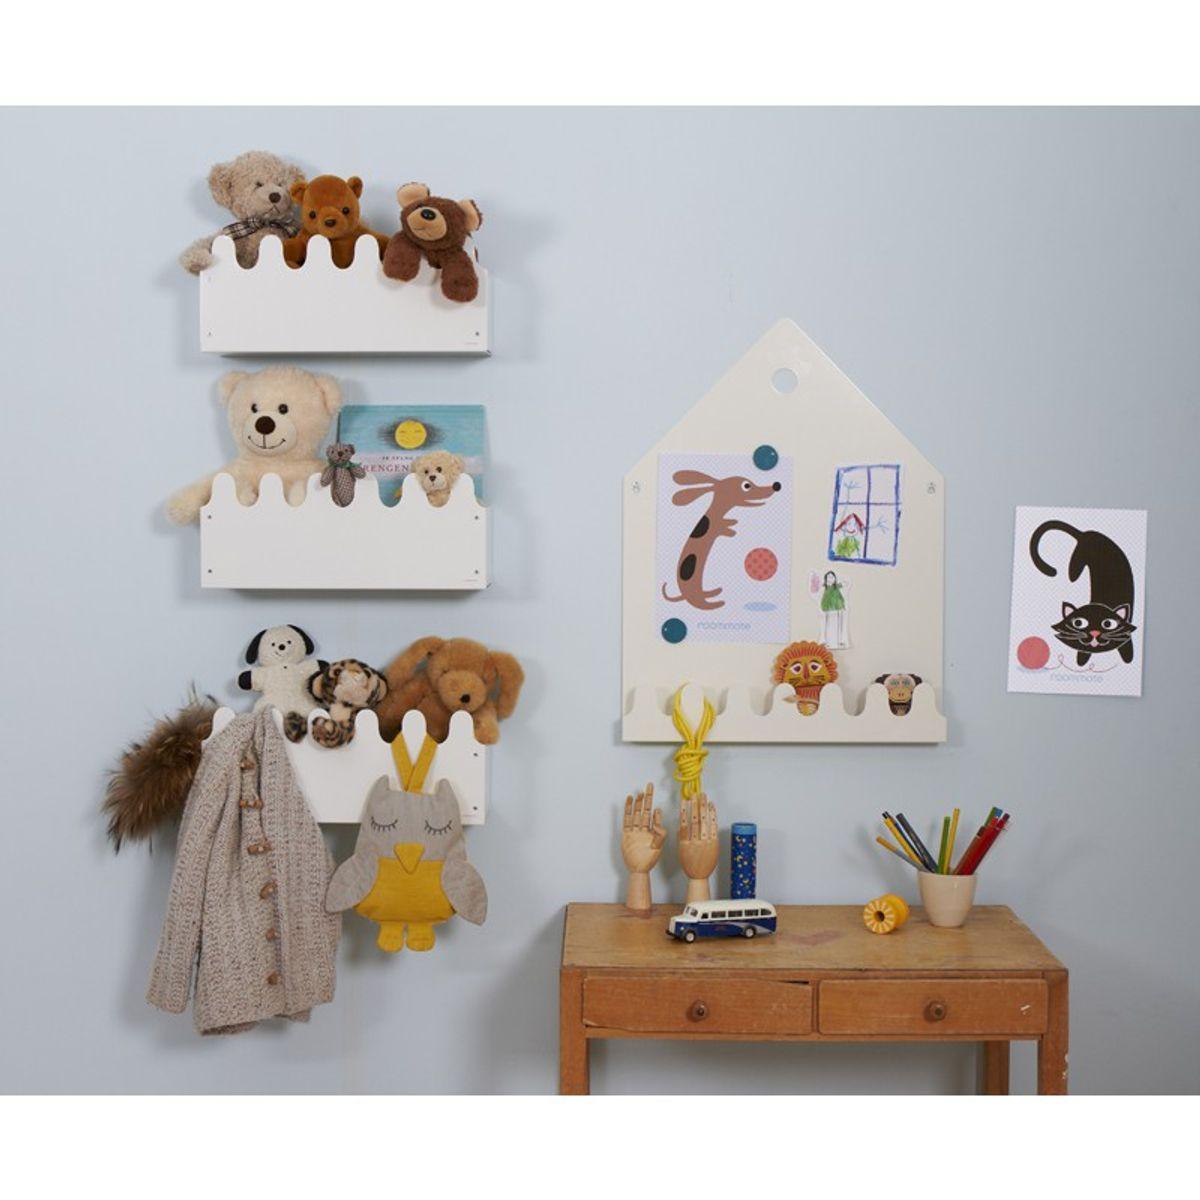 Magnettafel Kinderzimmer Groß | Magnettafel Garderobe Magnetic Board Weiss Roommate